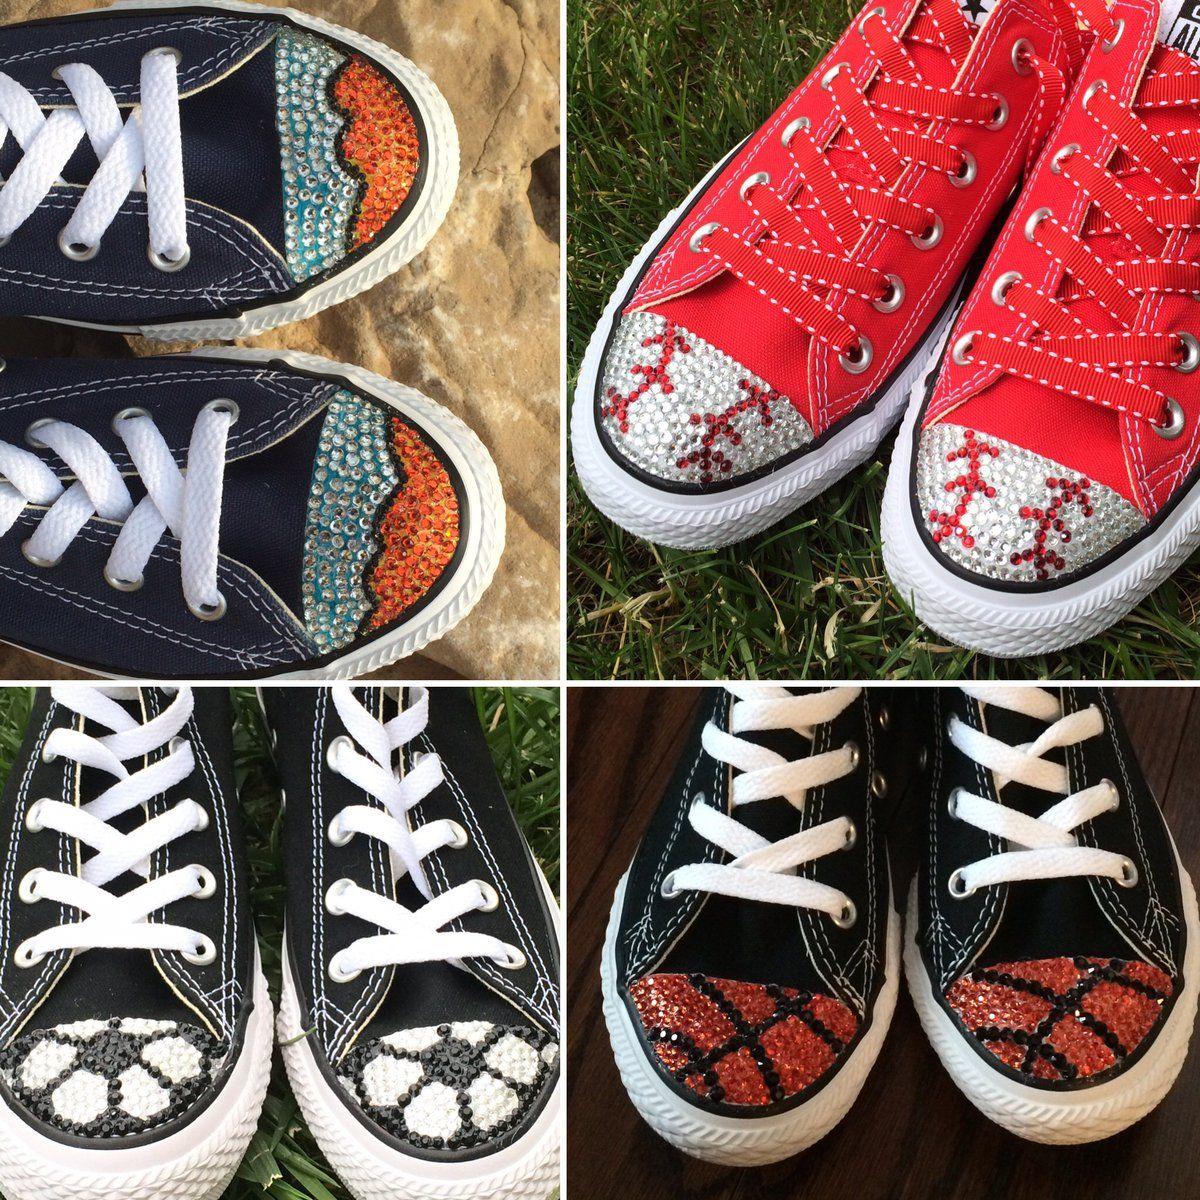 b1e1fb60bfbf ... uk custom converse shoes. custom made converse canada. soccer baseball  basketball beach ocean converse